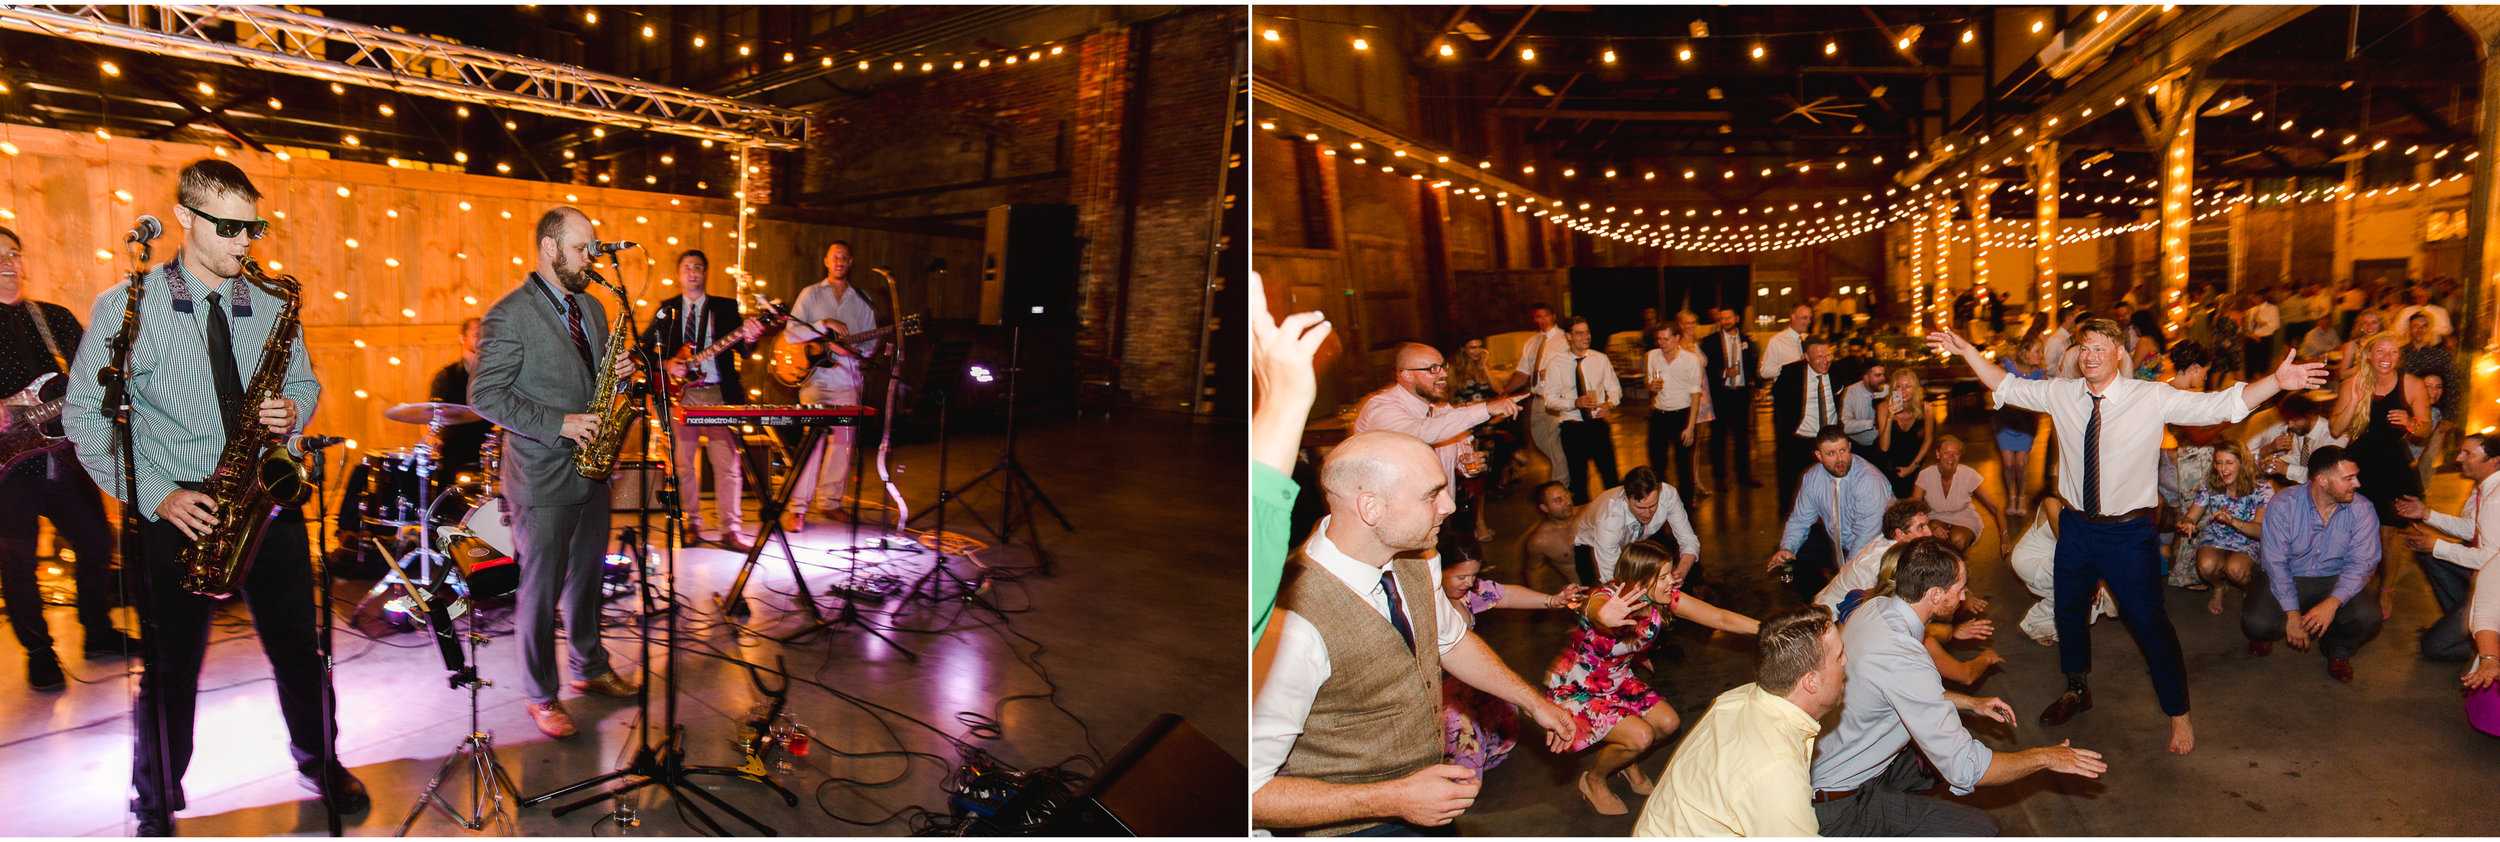 Portland, Maine Wedding at Brick South 40.jpg